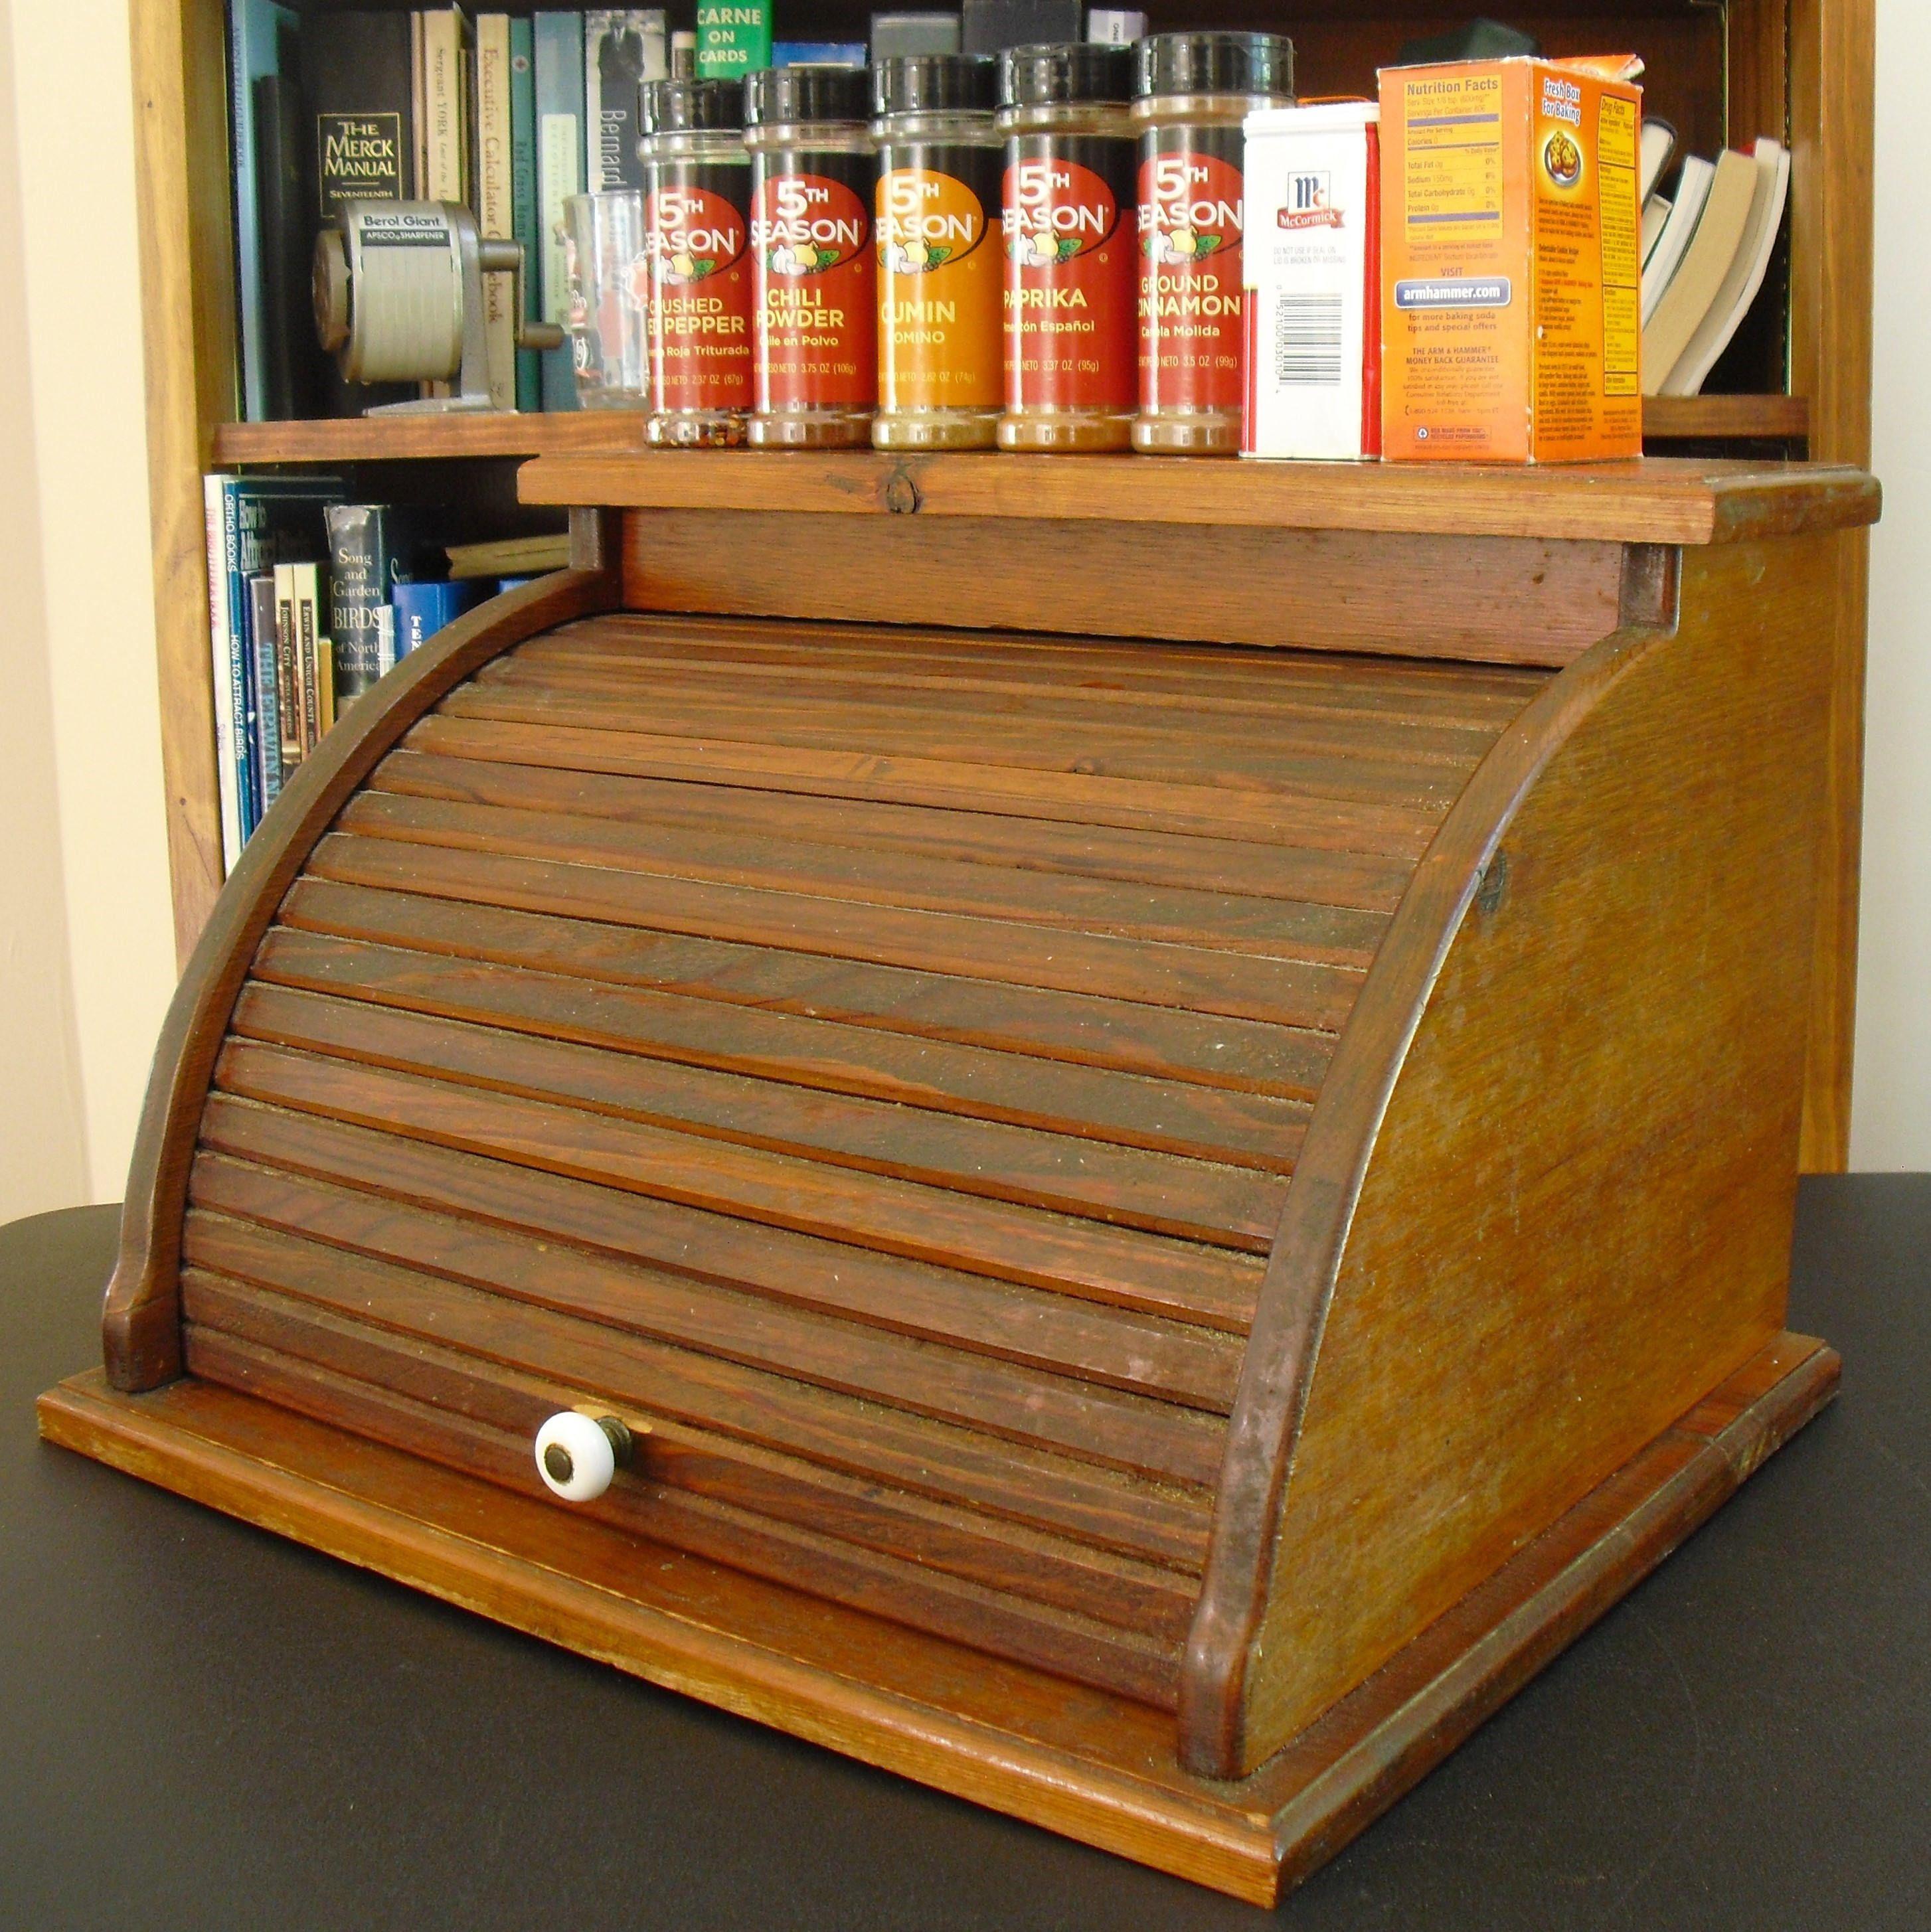 Vintage Wooden Roll Top Bread Box, Rustic Brown Bread Bin,